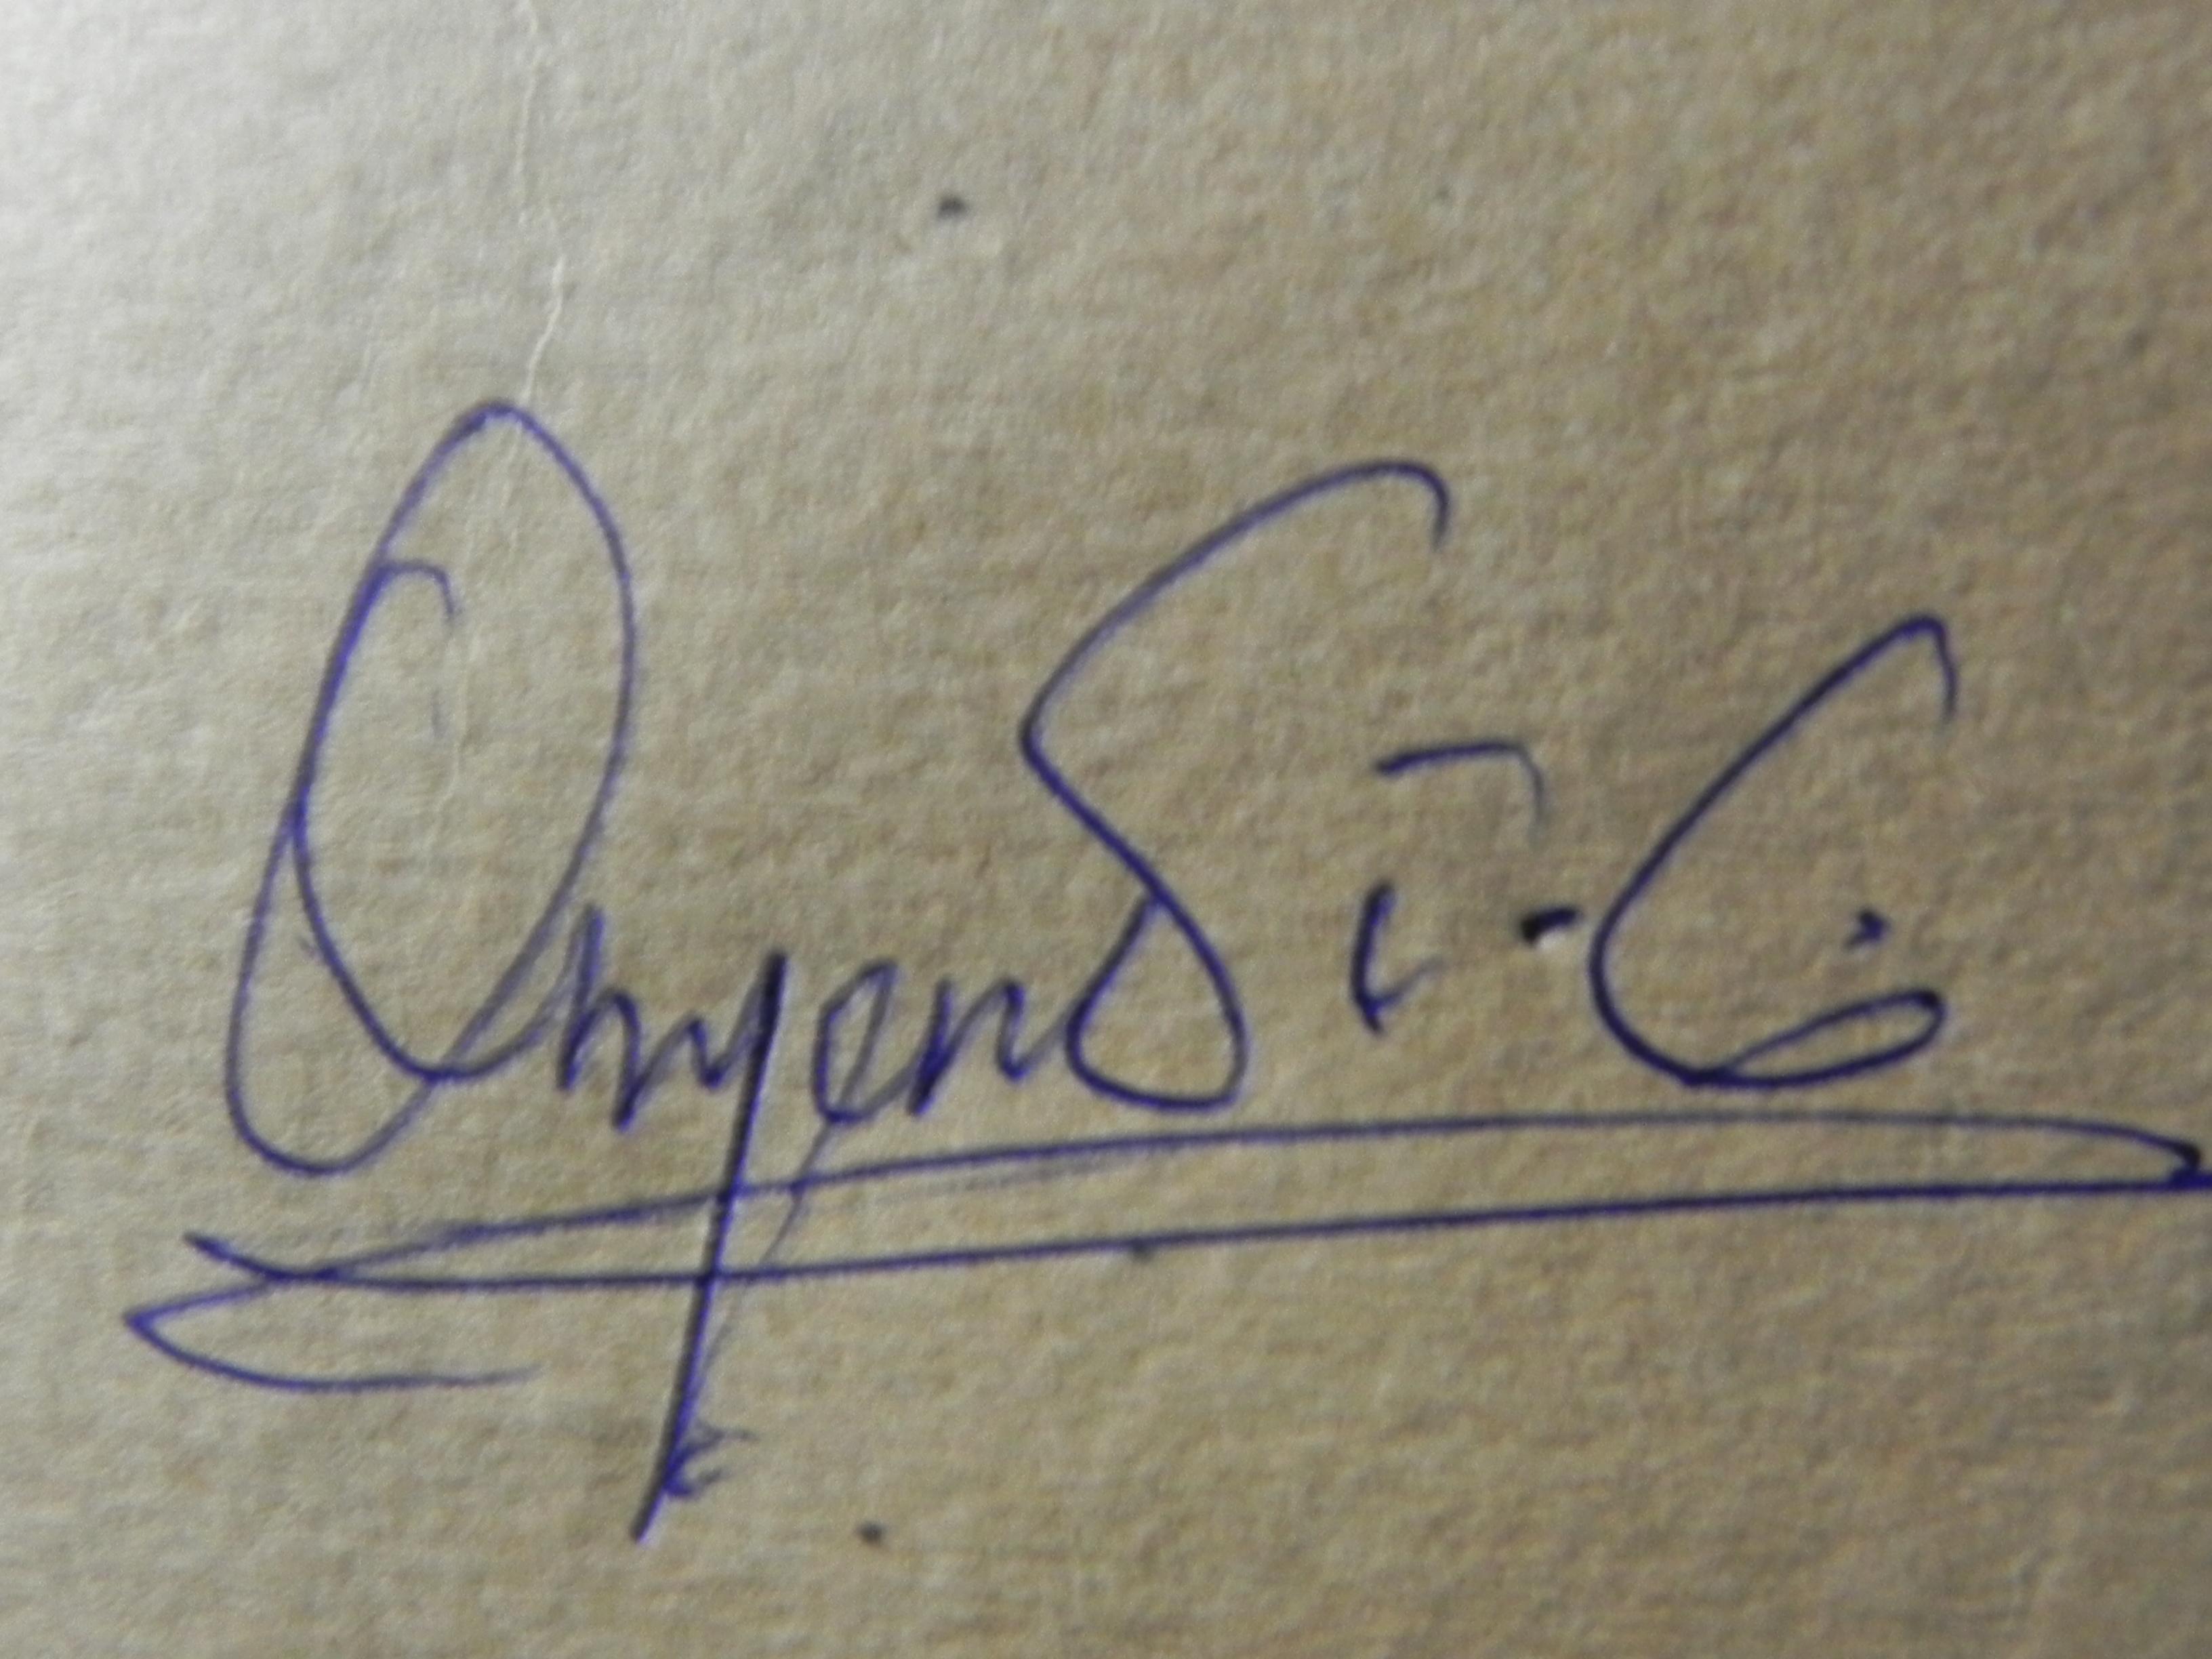 Onyendi Chukwudi's Signature